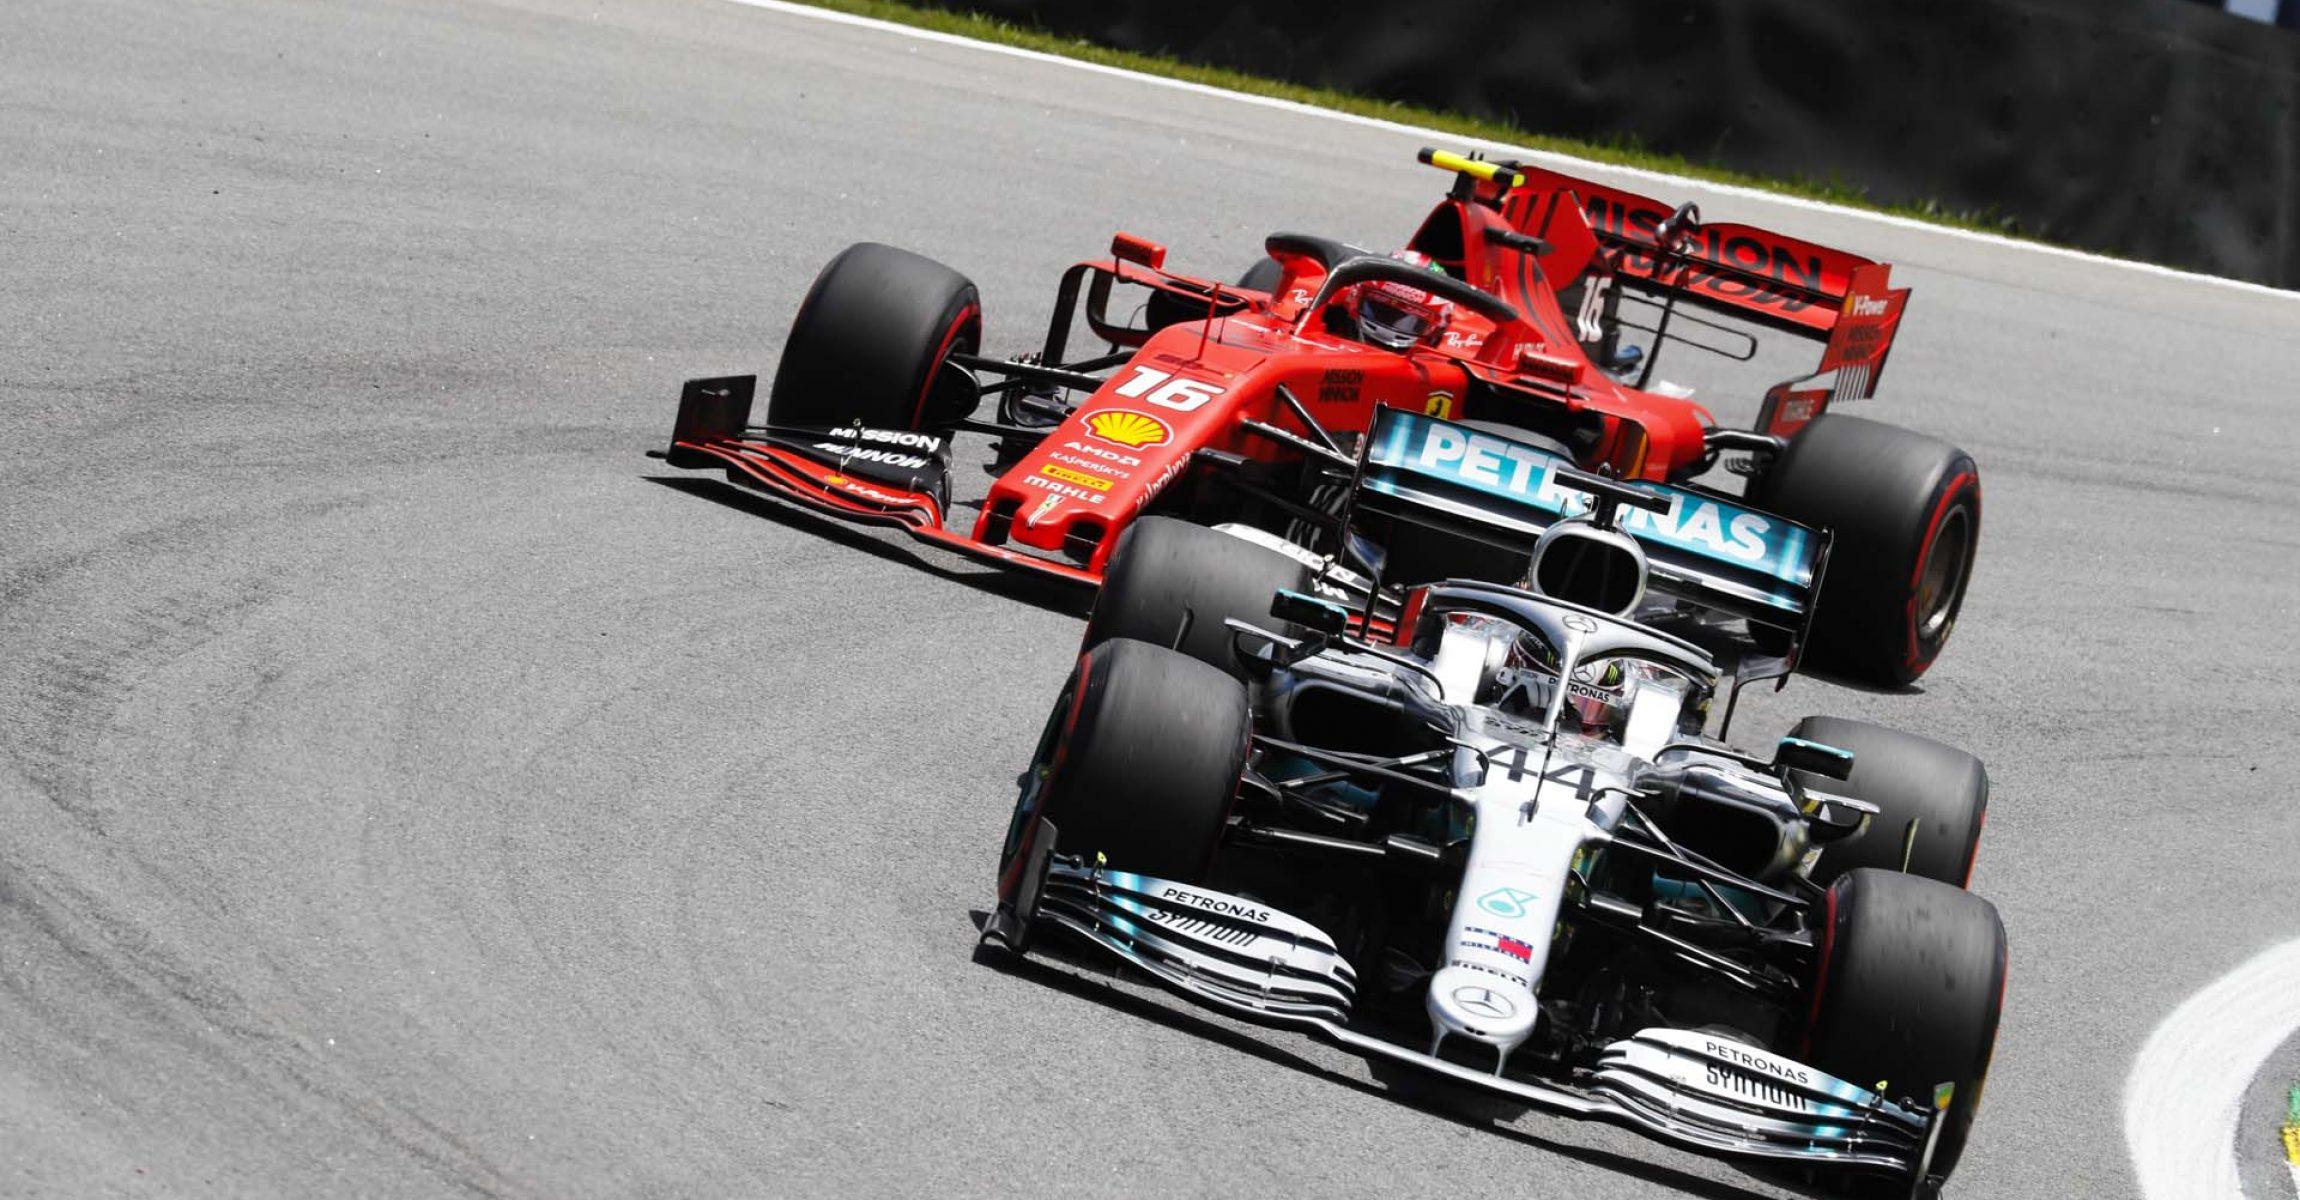 2019 Brazilian Grand Prix, Saturday - Wolfgang Wilhelm Lewis Hamilton followed by Charles Leclerc Mercedes Ferrari